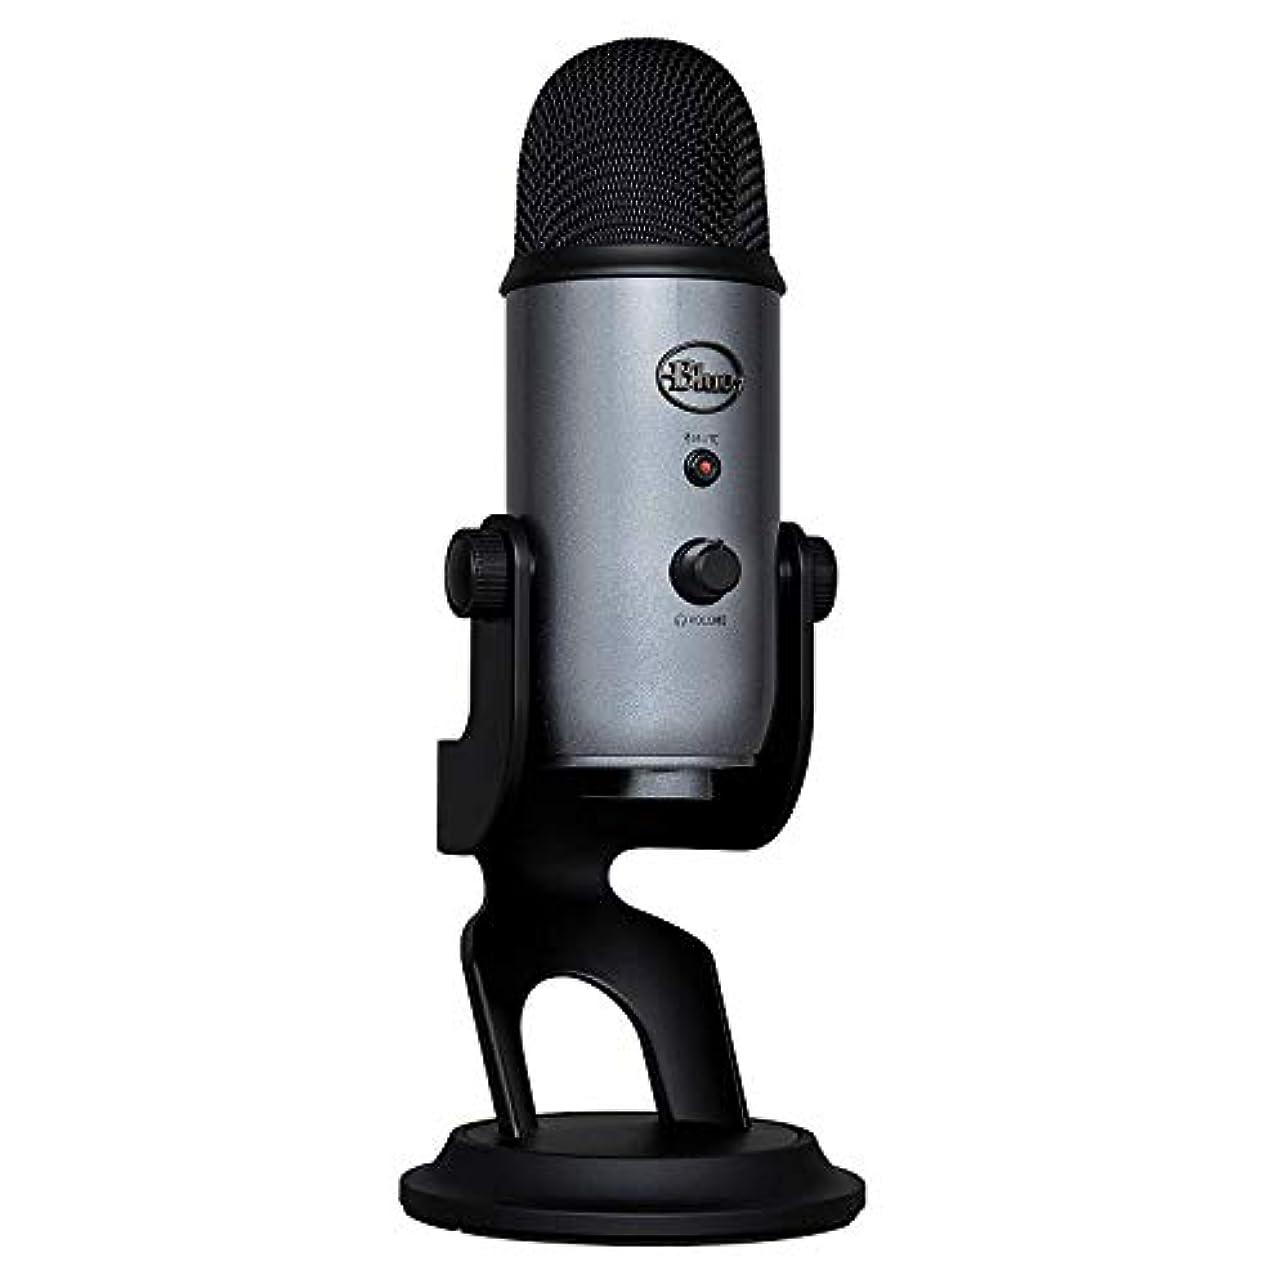 化学薬品債権者値するBlue Microphones Yeti USB Microphone - Lunar Grey [並行輸入品]